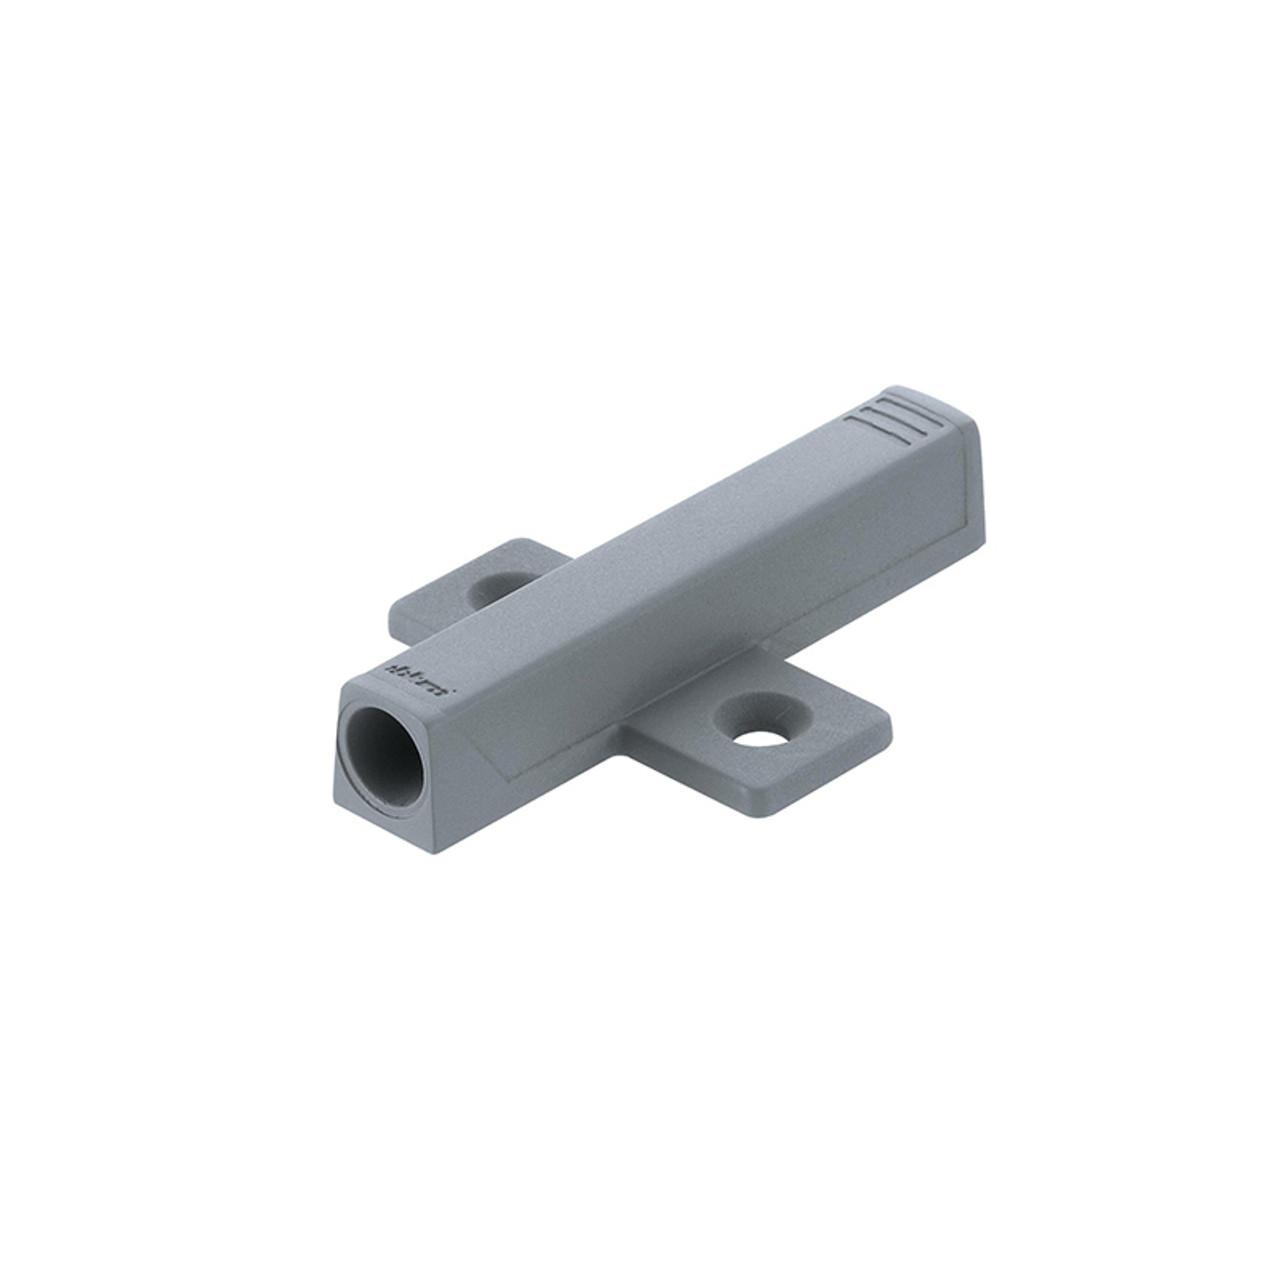 TIP-ON for Doors Cruciform Adapter Plate - Grey